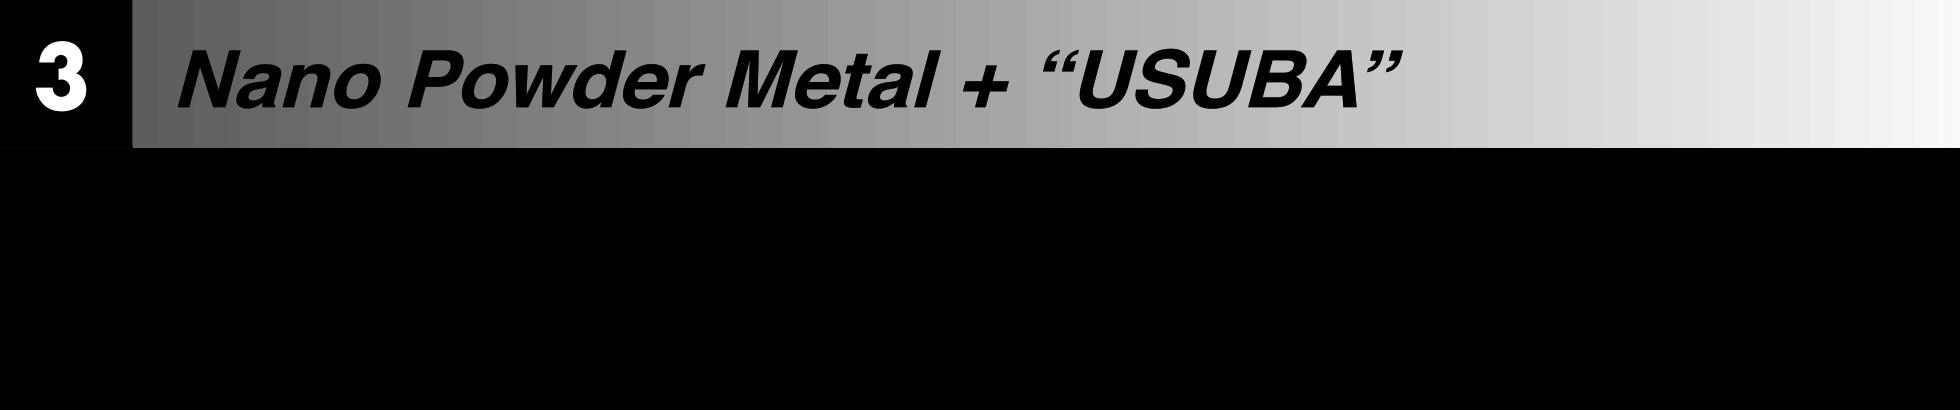 "Nano Powder Metal + ""USUBA"""